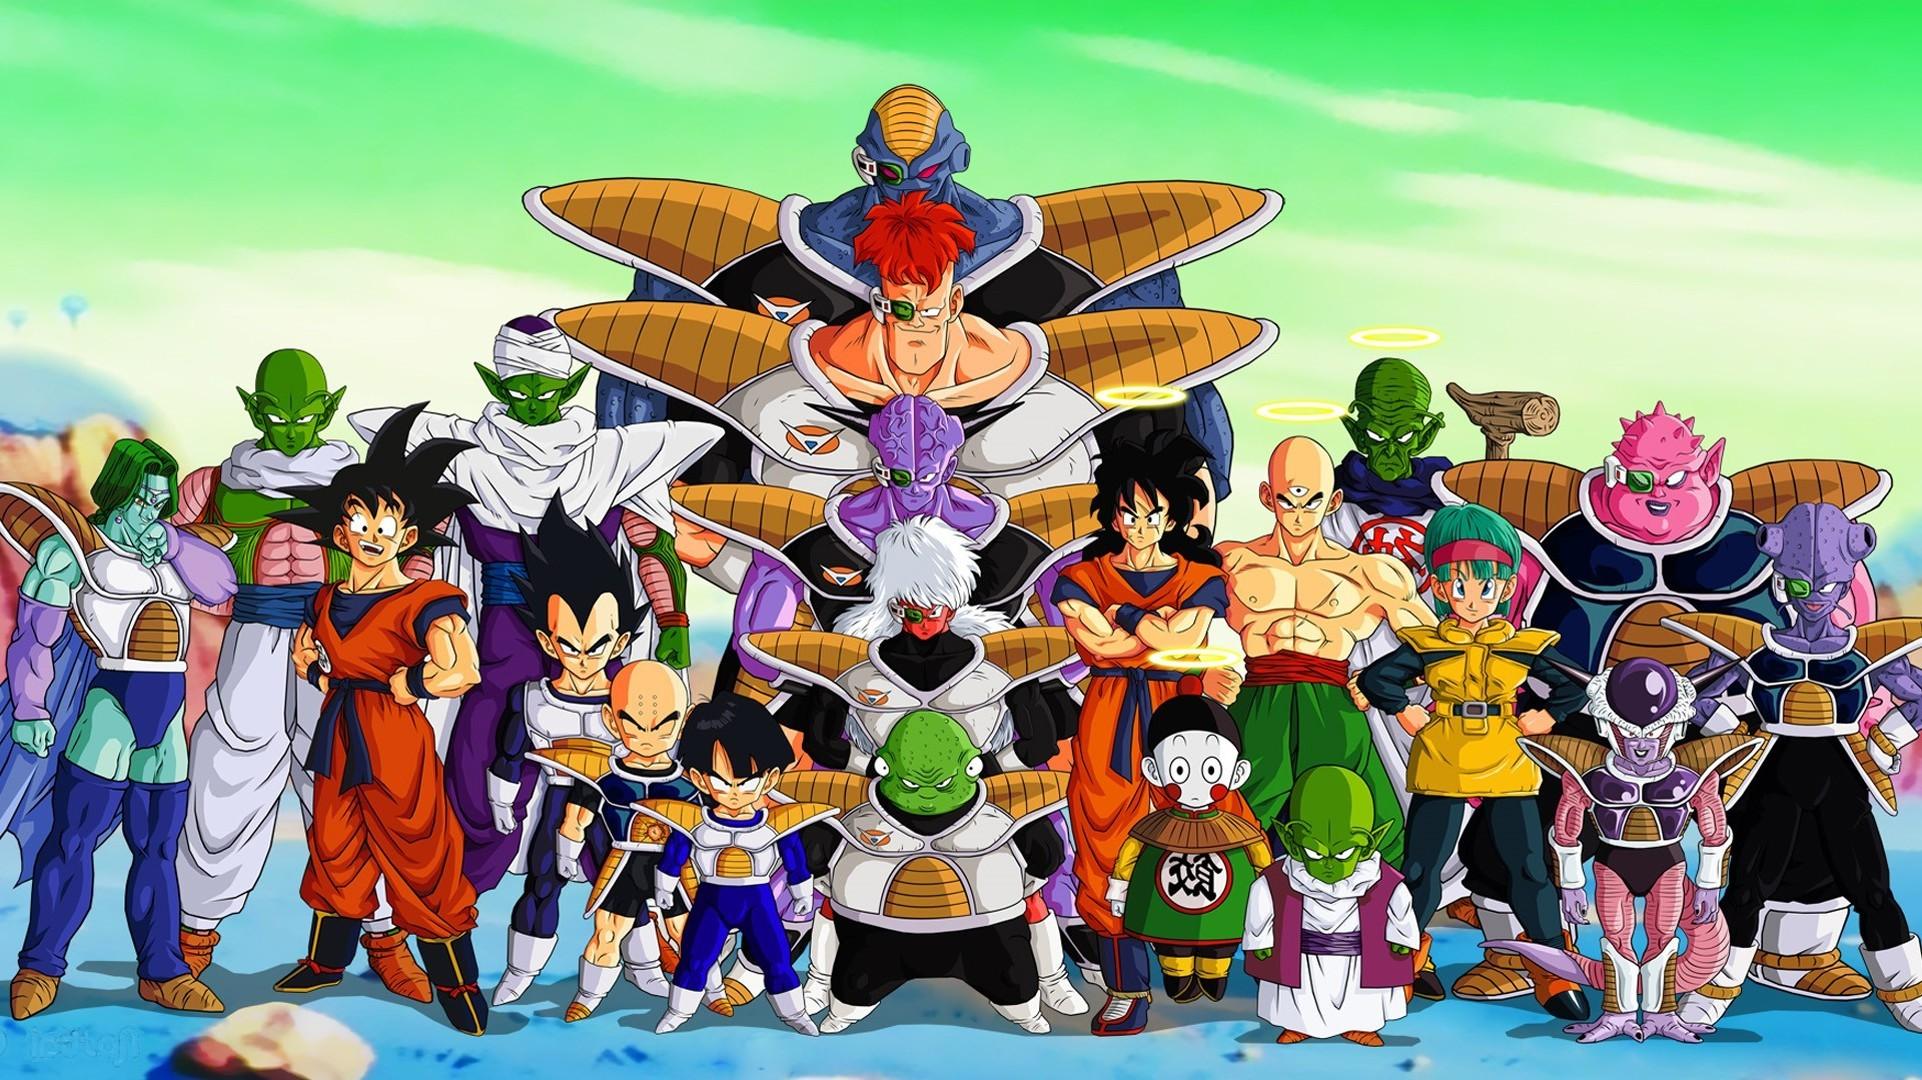 Dragon Ball Z Piccolo Wallpaper (68+ images)